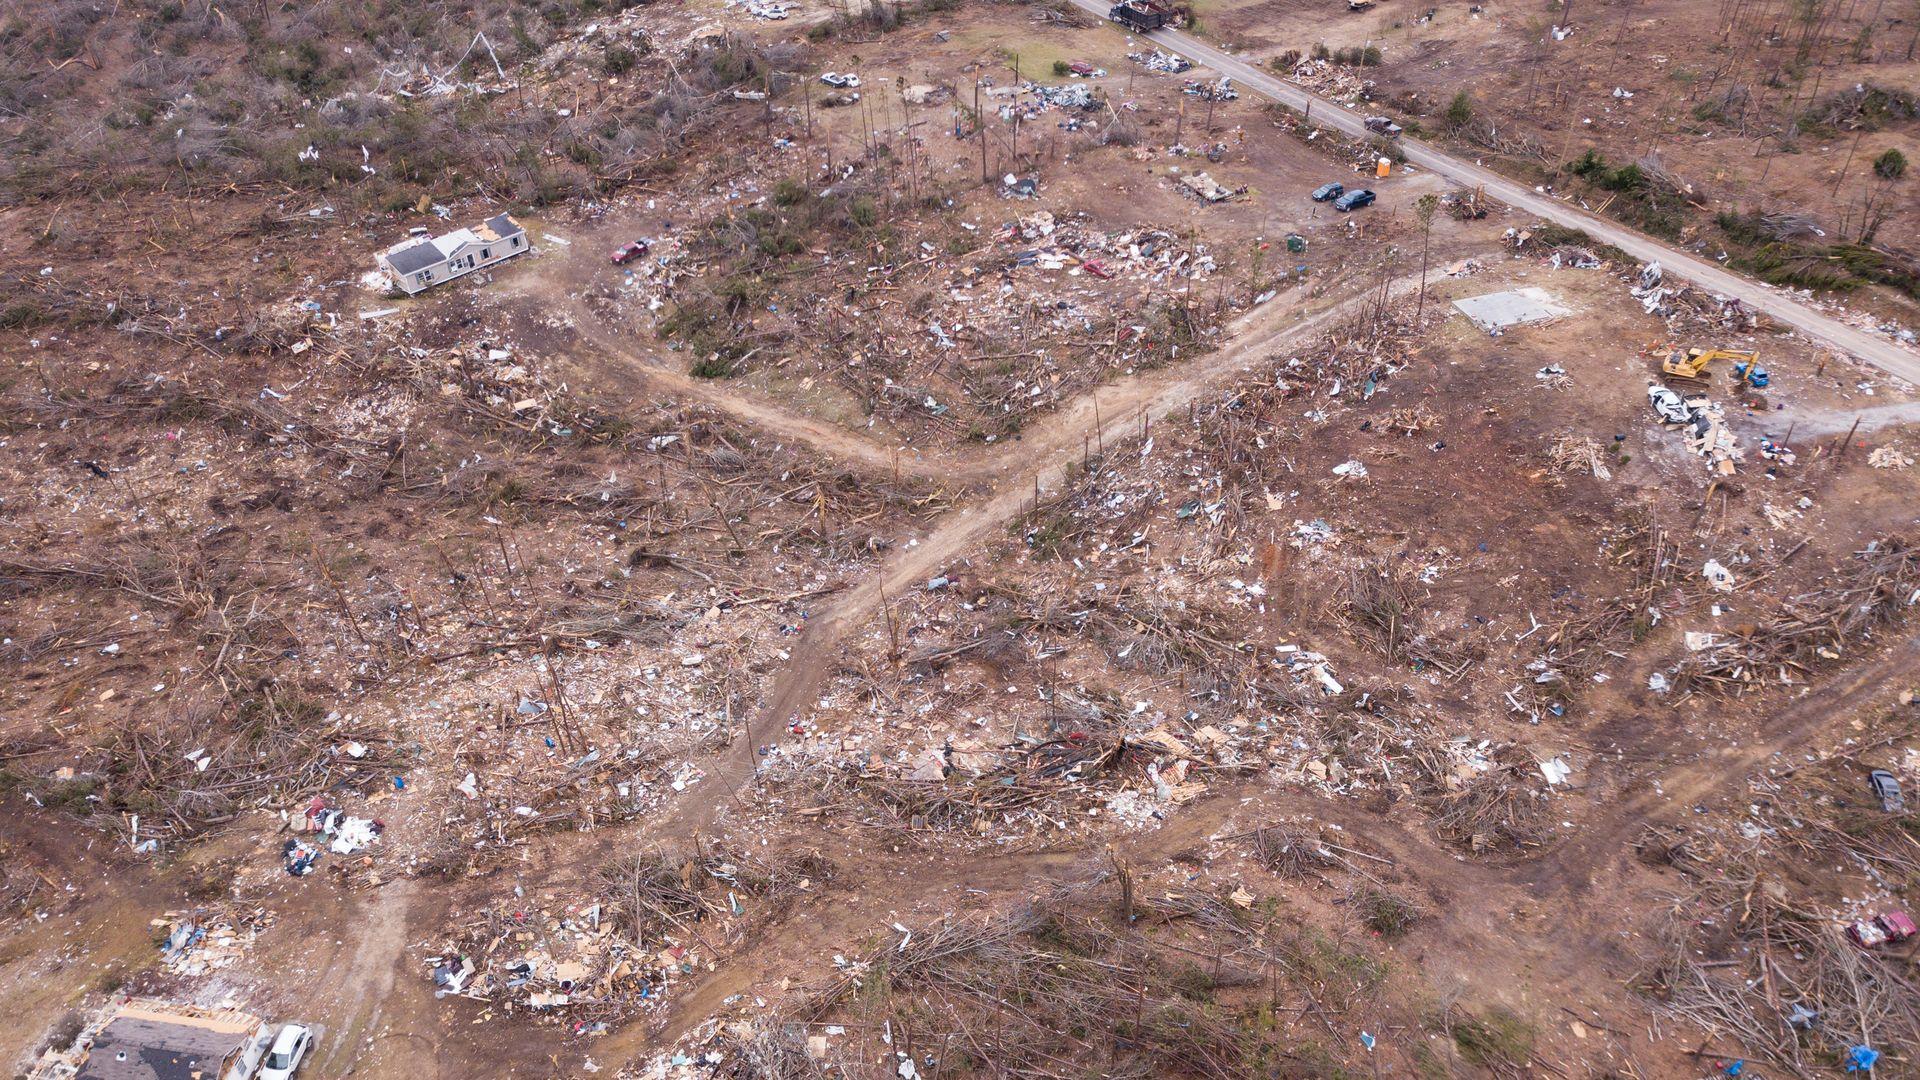 Damage from an Alabama tornado